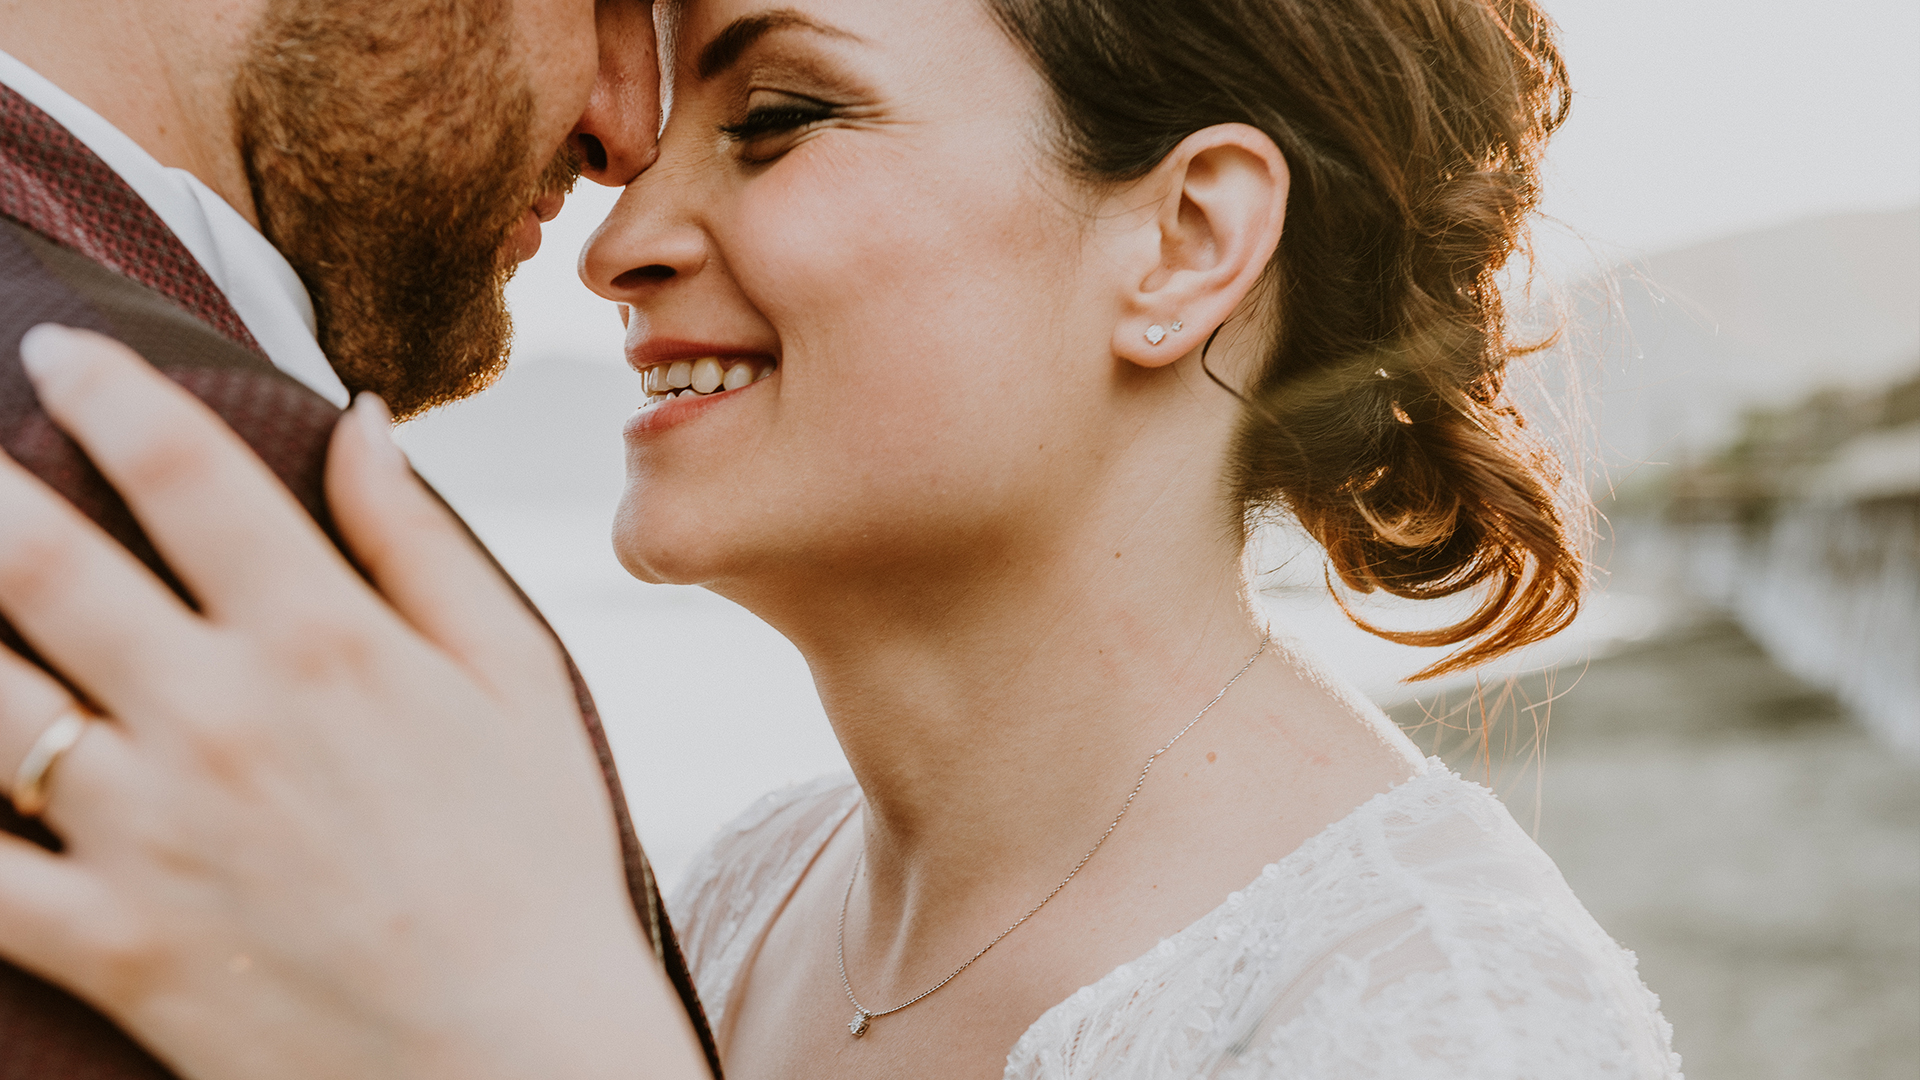 paola-simonelli-fotografa-fotografo-matrimonio-nozze-roma-fondi-terracina-gaeta-sperlonga-itri-monte-san-biagio-sabaudia